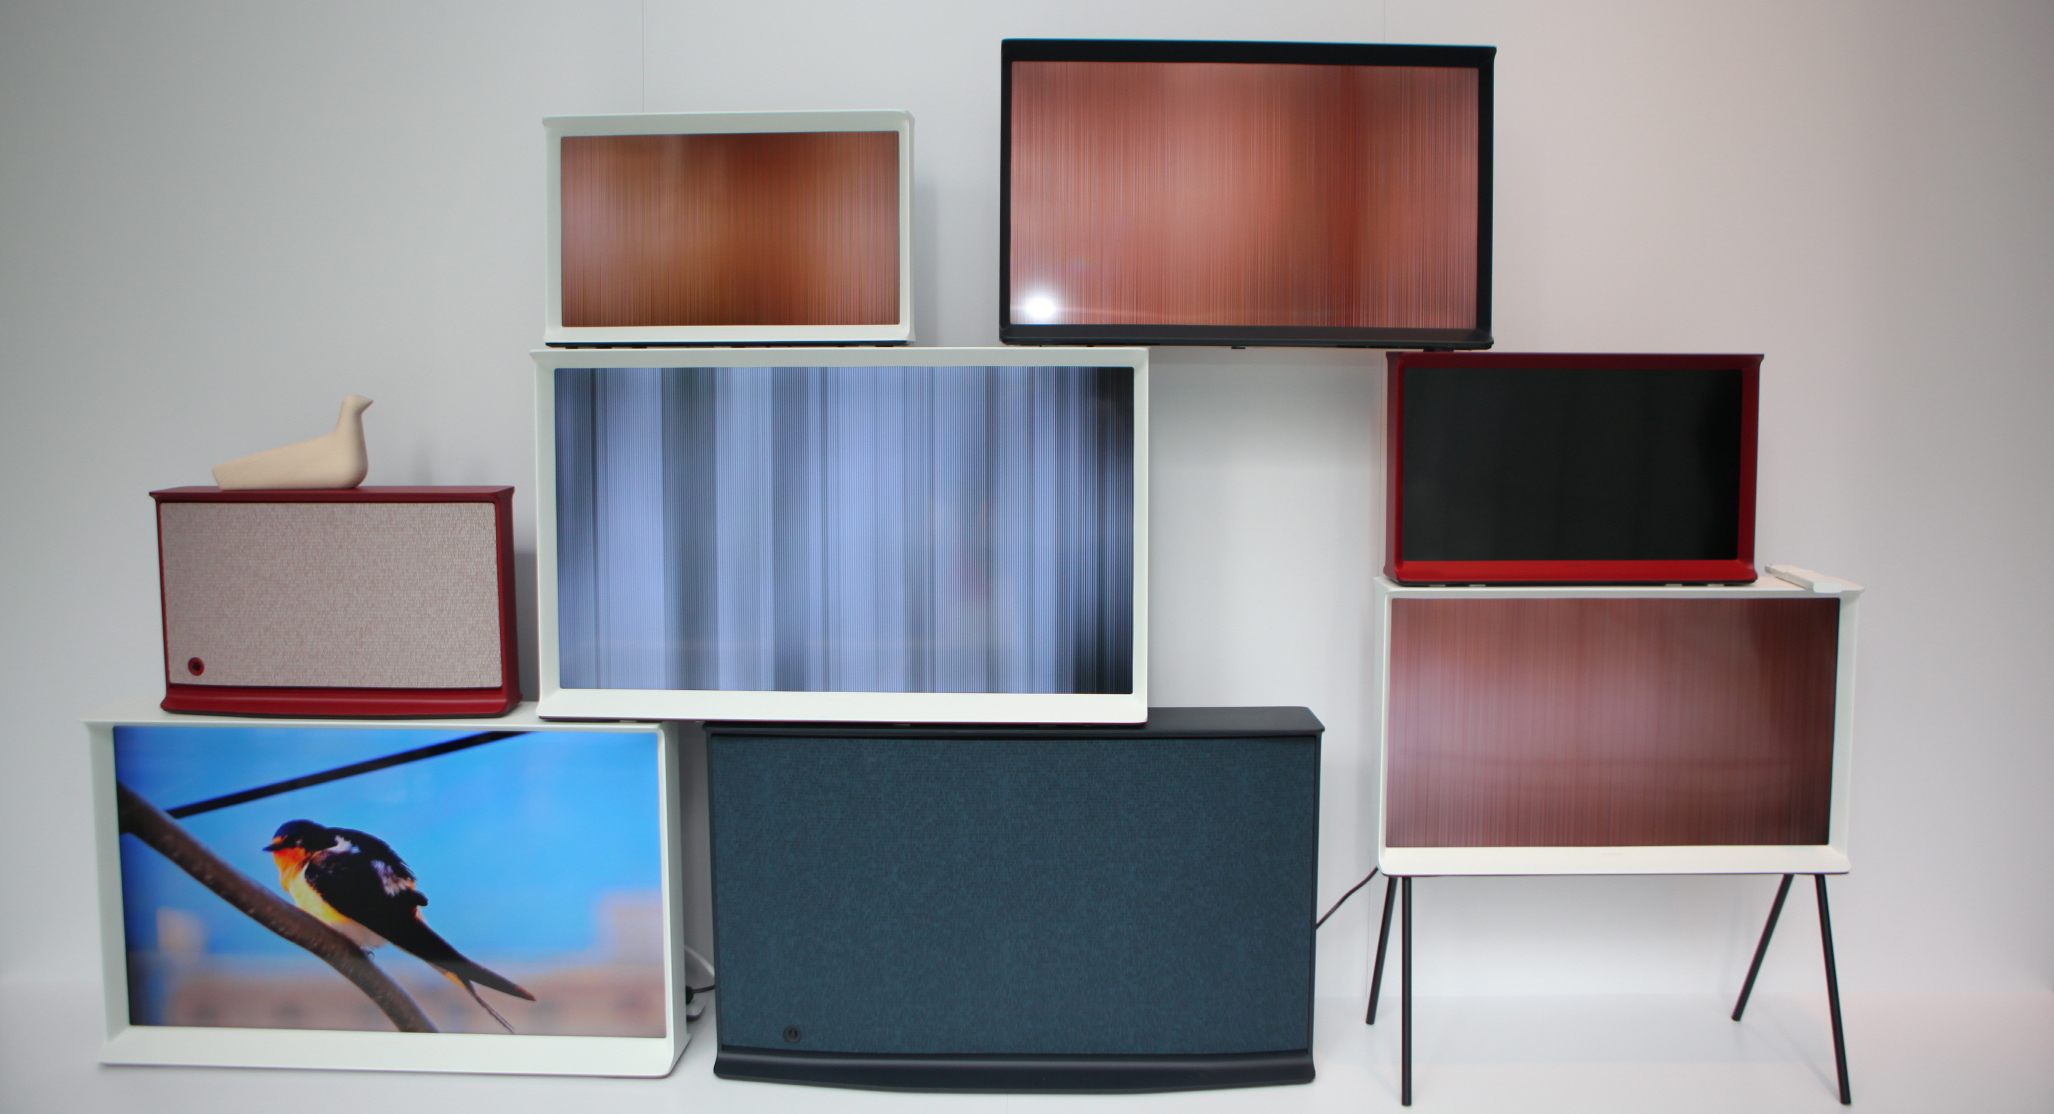 samsung-serif-tvs